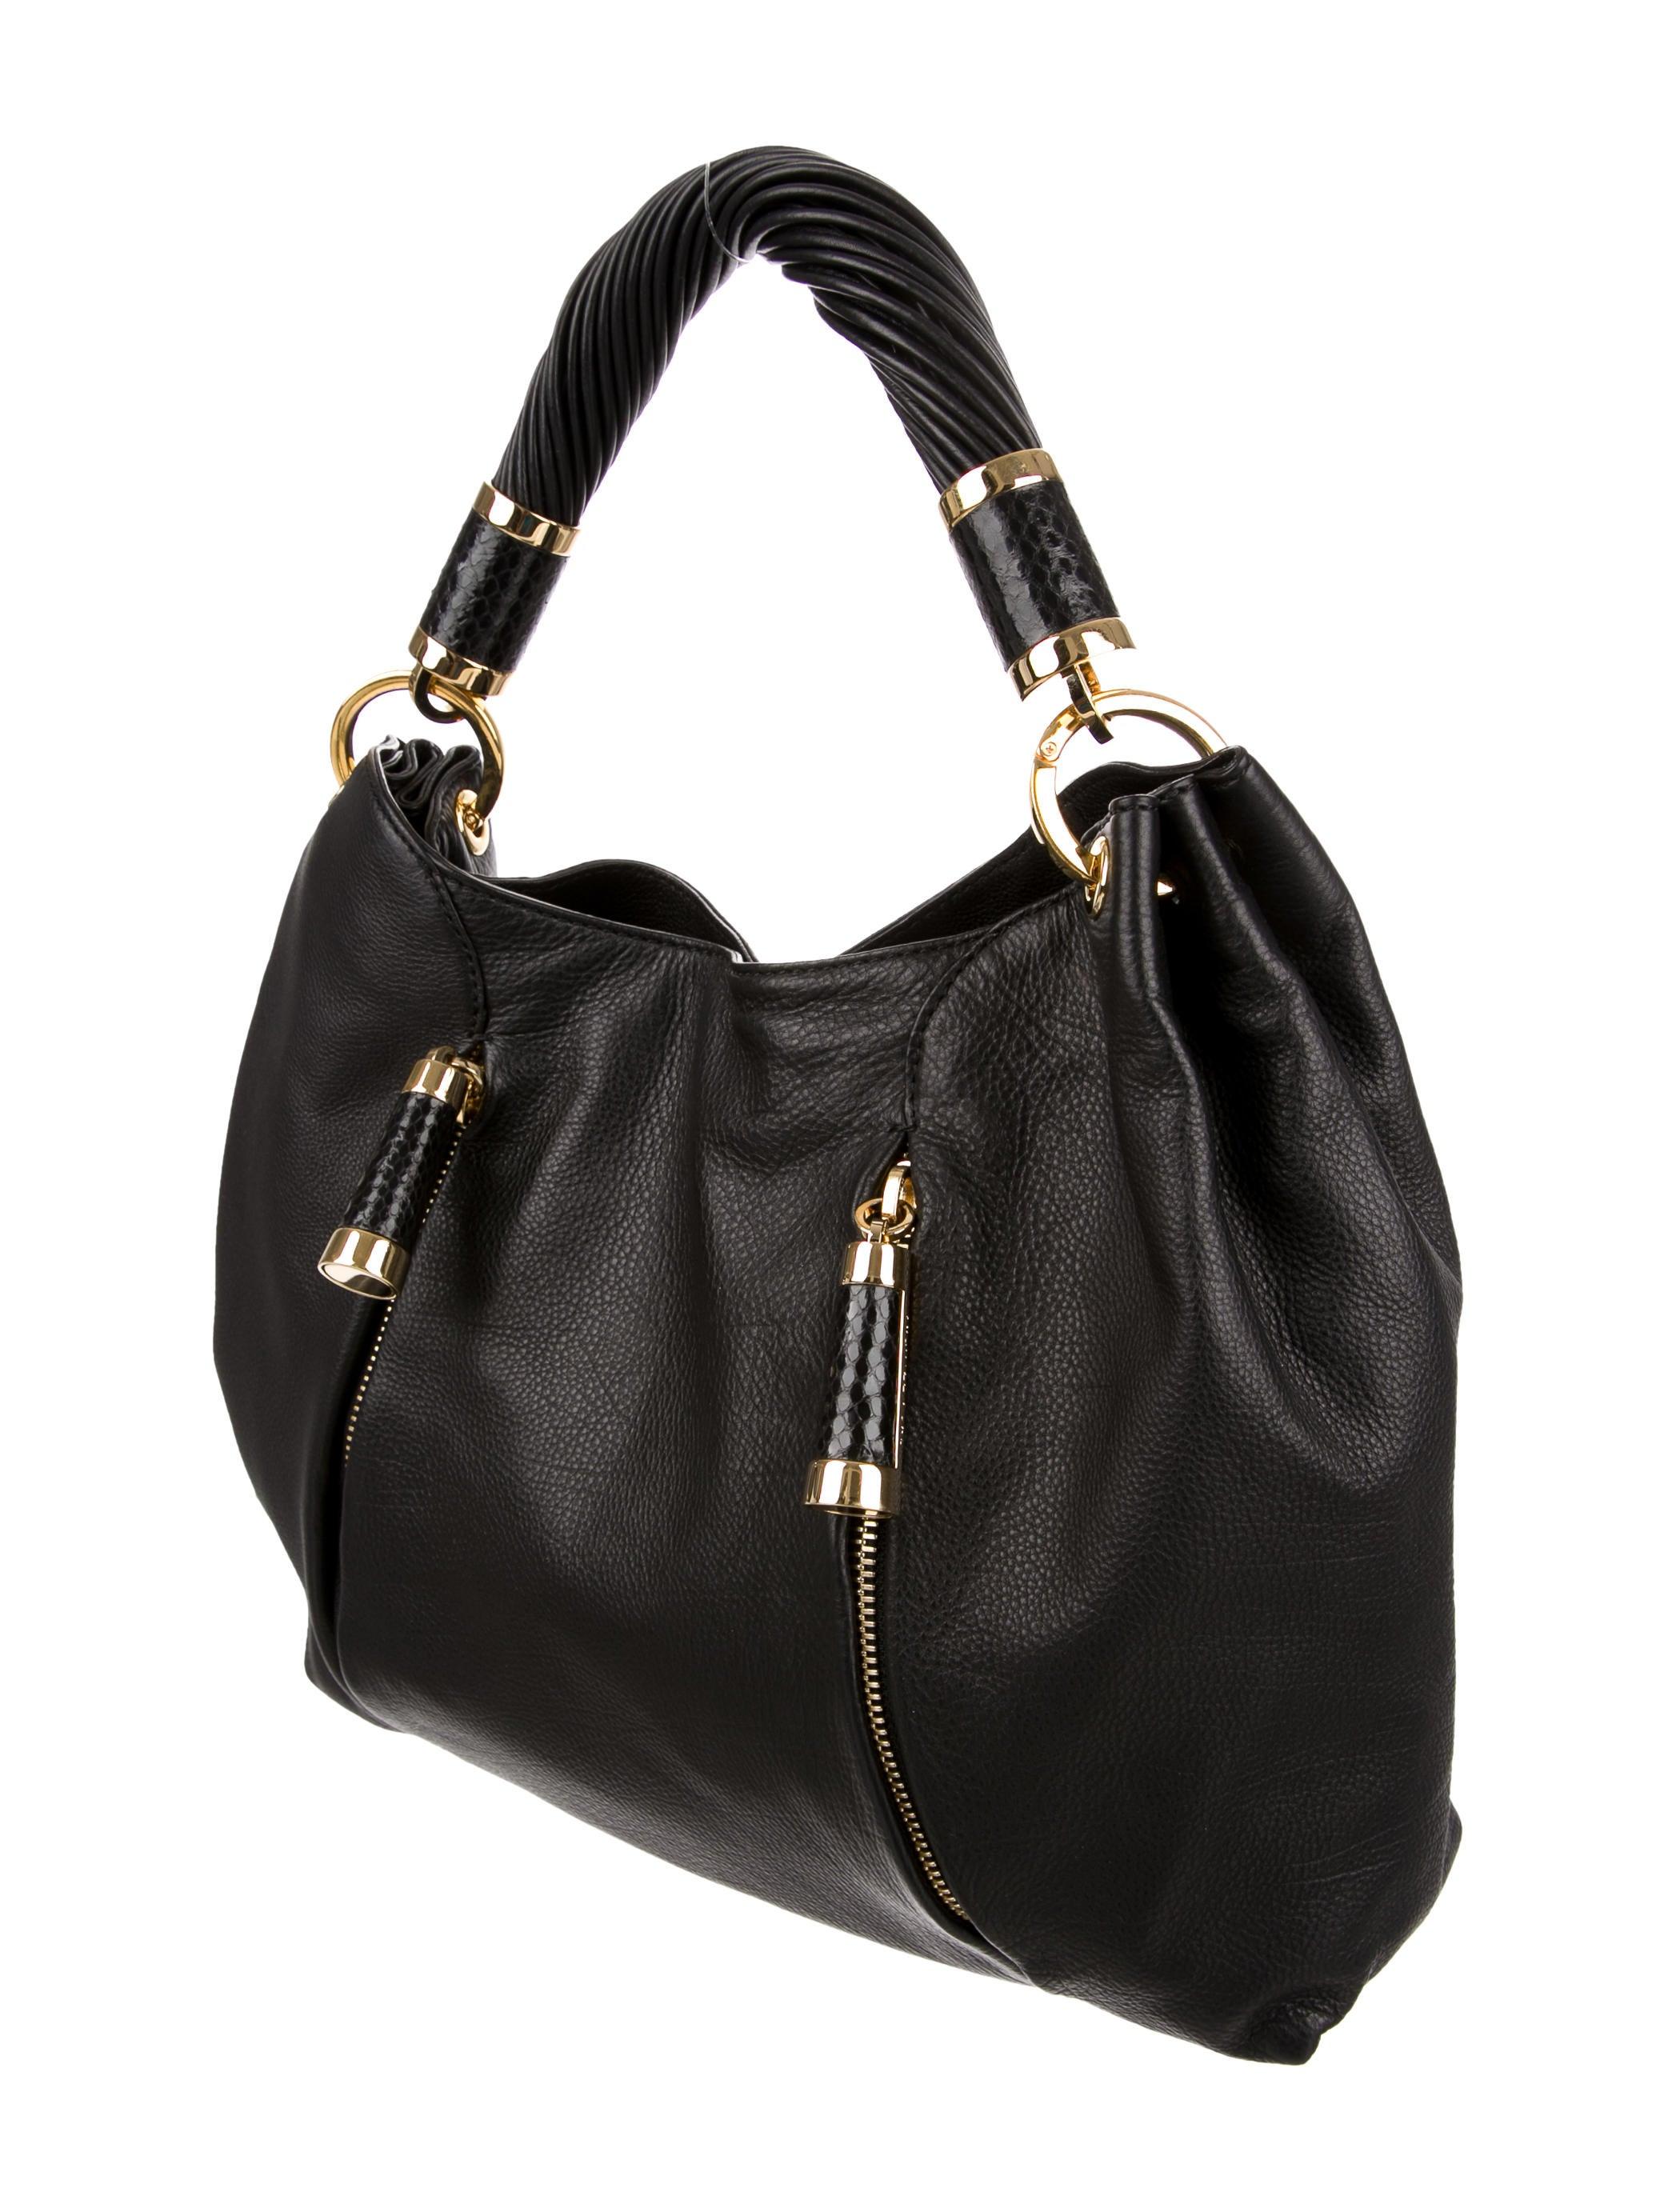 michael kors tonne hobo bag handbags mic47804 the realreal. Black Bedroom Furniture Sets. Home Design Ideas